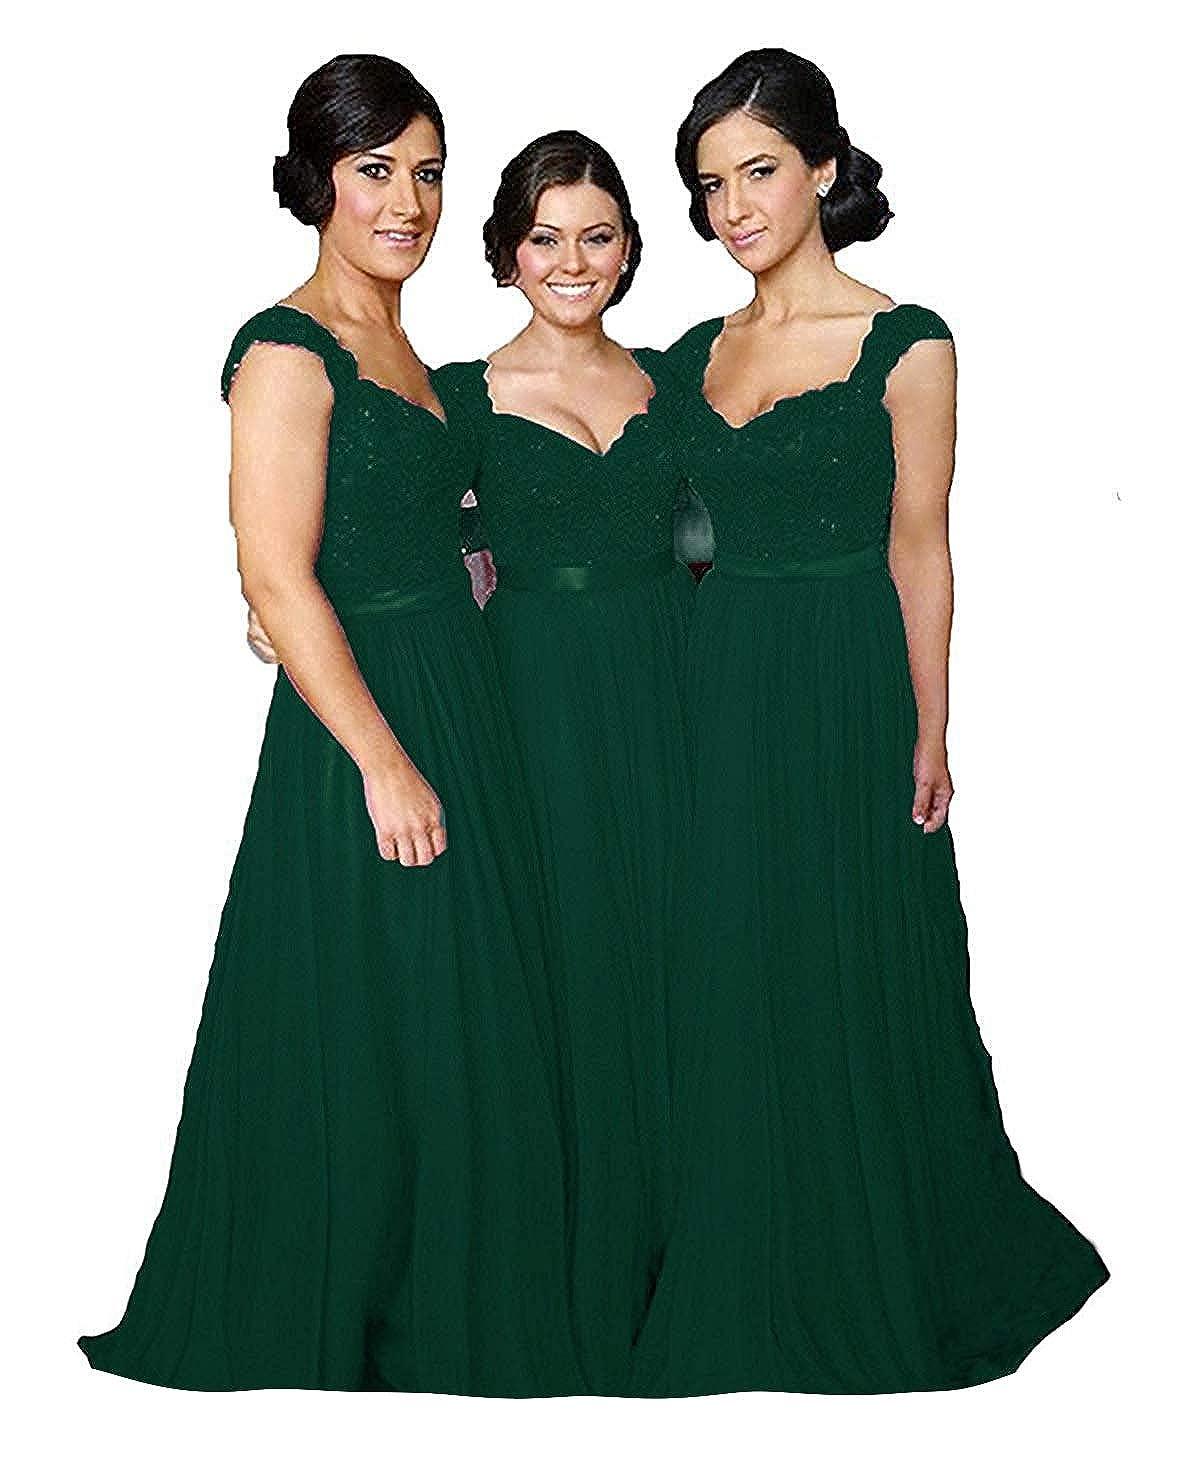 Dark Green Fanciest Women' Cap Sleeve Lace Bridesmaid Dresses Long Wedding Party Gowns